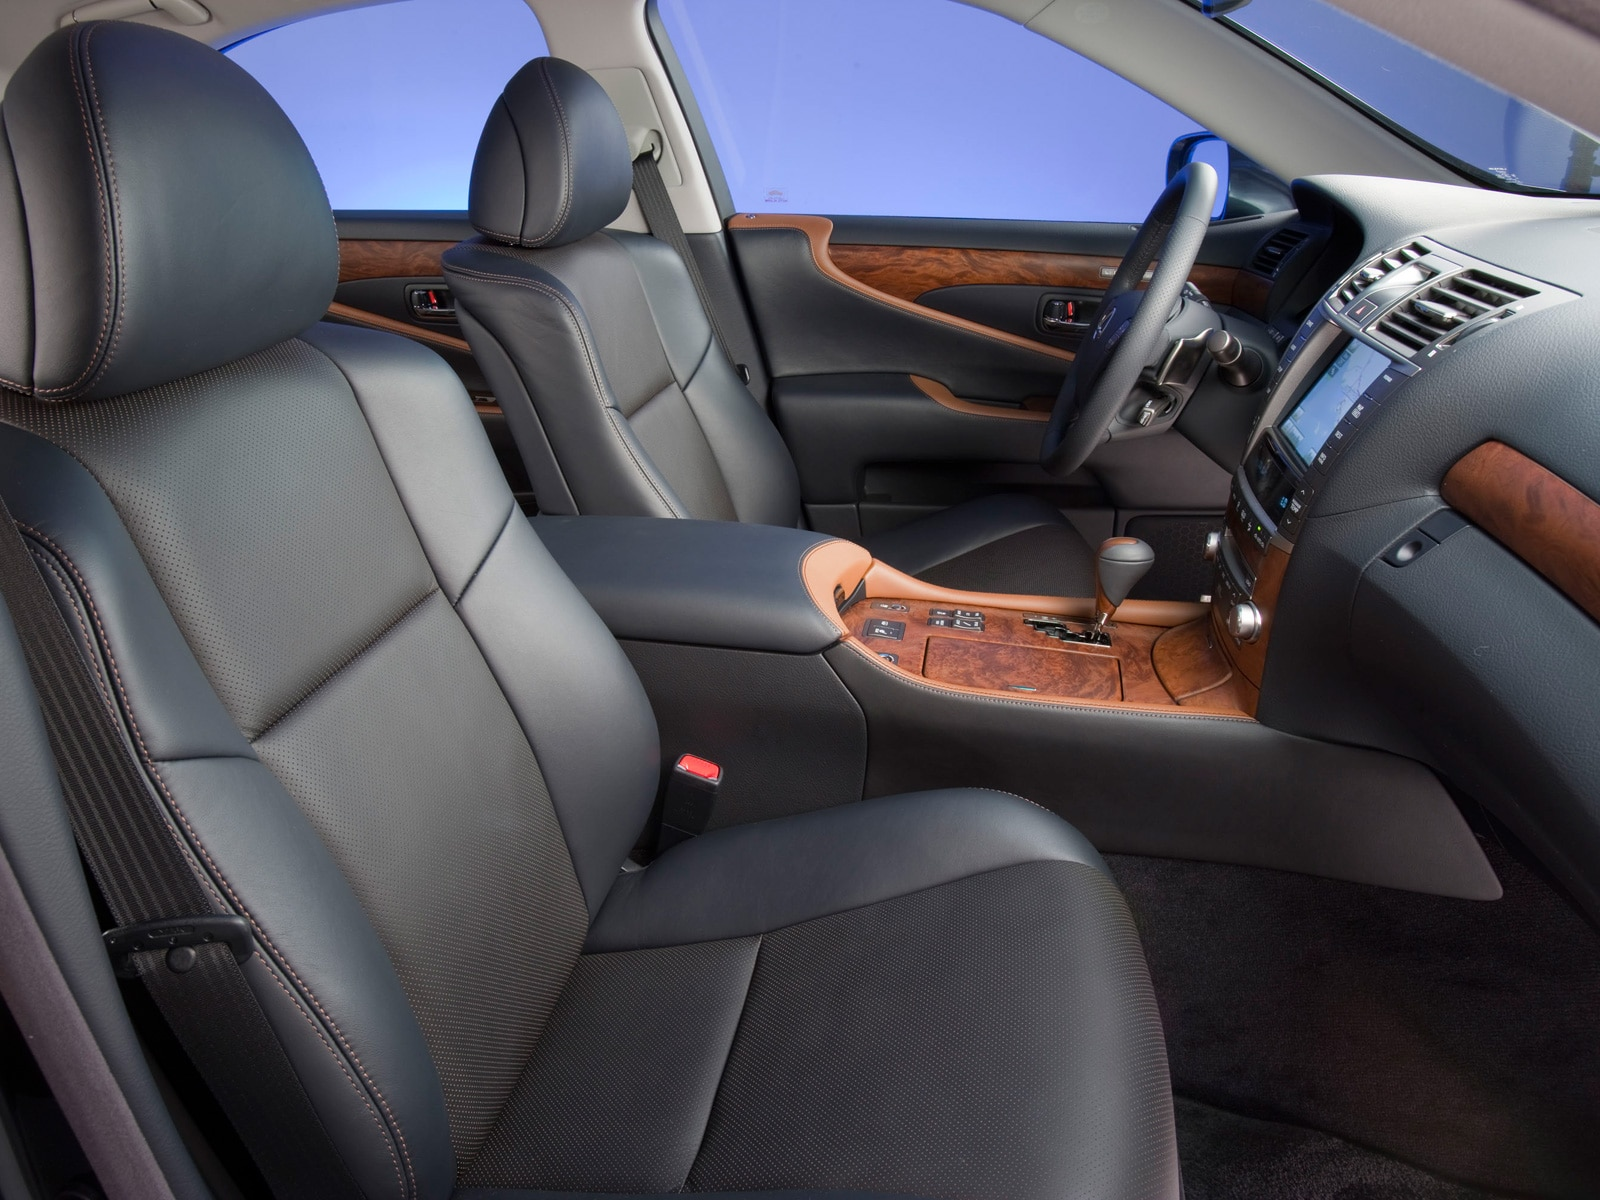 http://st.automobilemag.com/uploads/sites/11/2009/11/0911_10_z-2010_lexus_lS_460_sport-front_interior.jpg